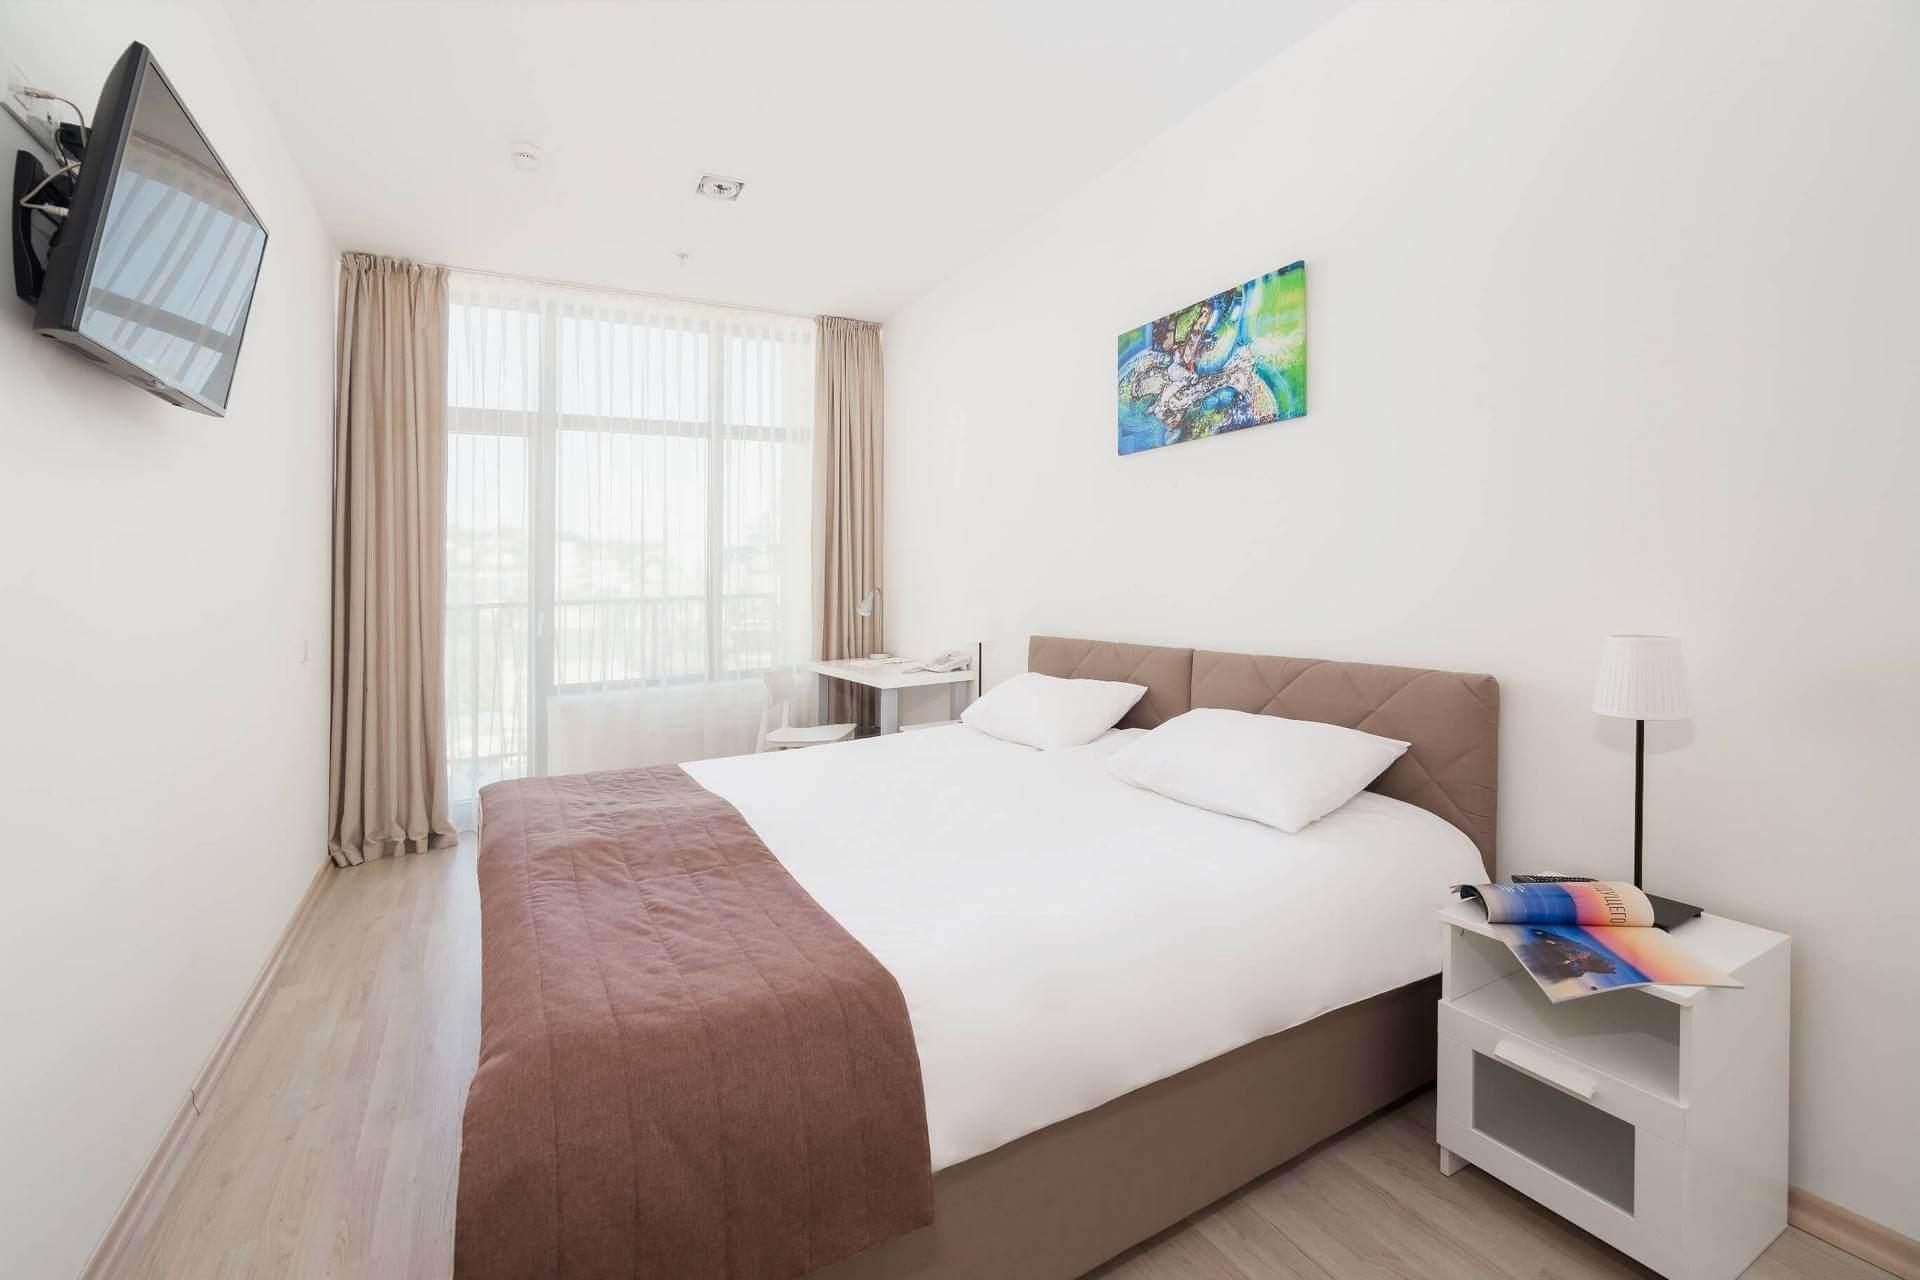 Три апартамента в центре курорта - image Tri-apartamenta-v-tsentre-kurorta-2 on https://bizneskvartal.ru